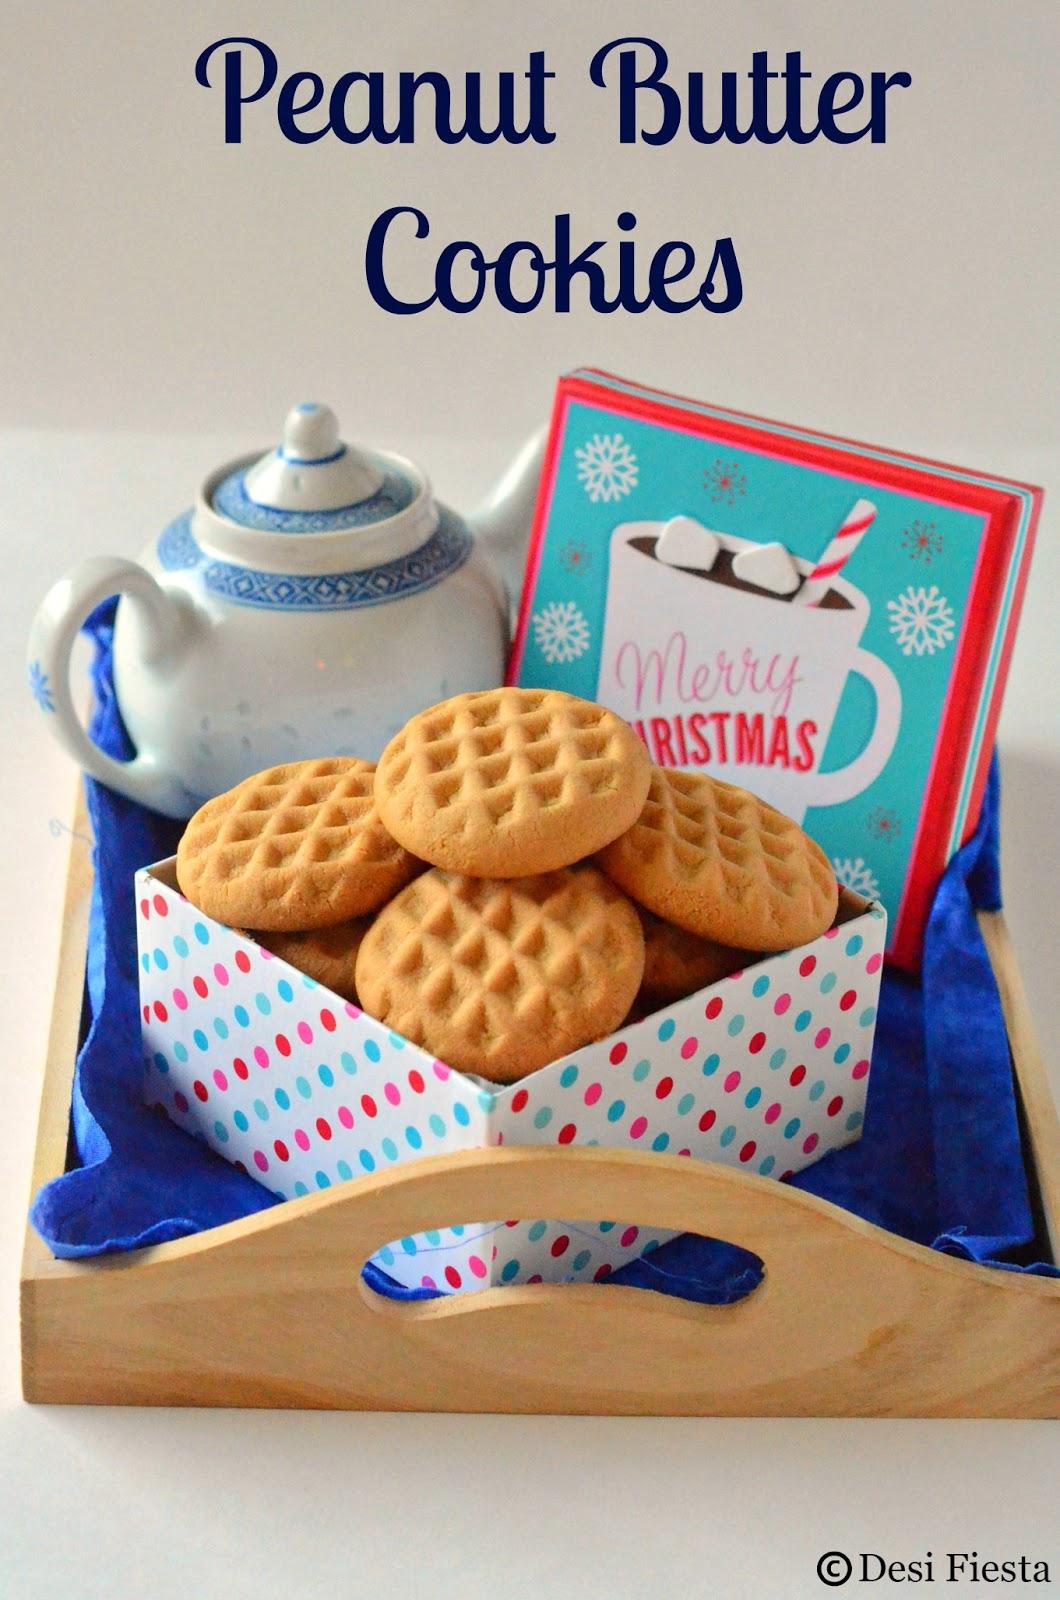 Best Peanut Butter Cookies Recipes